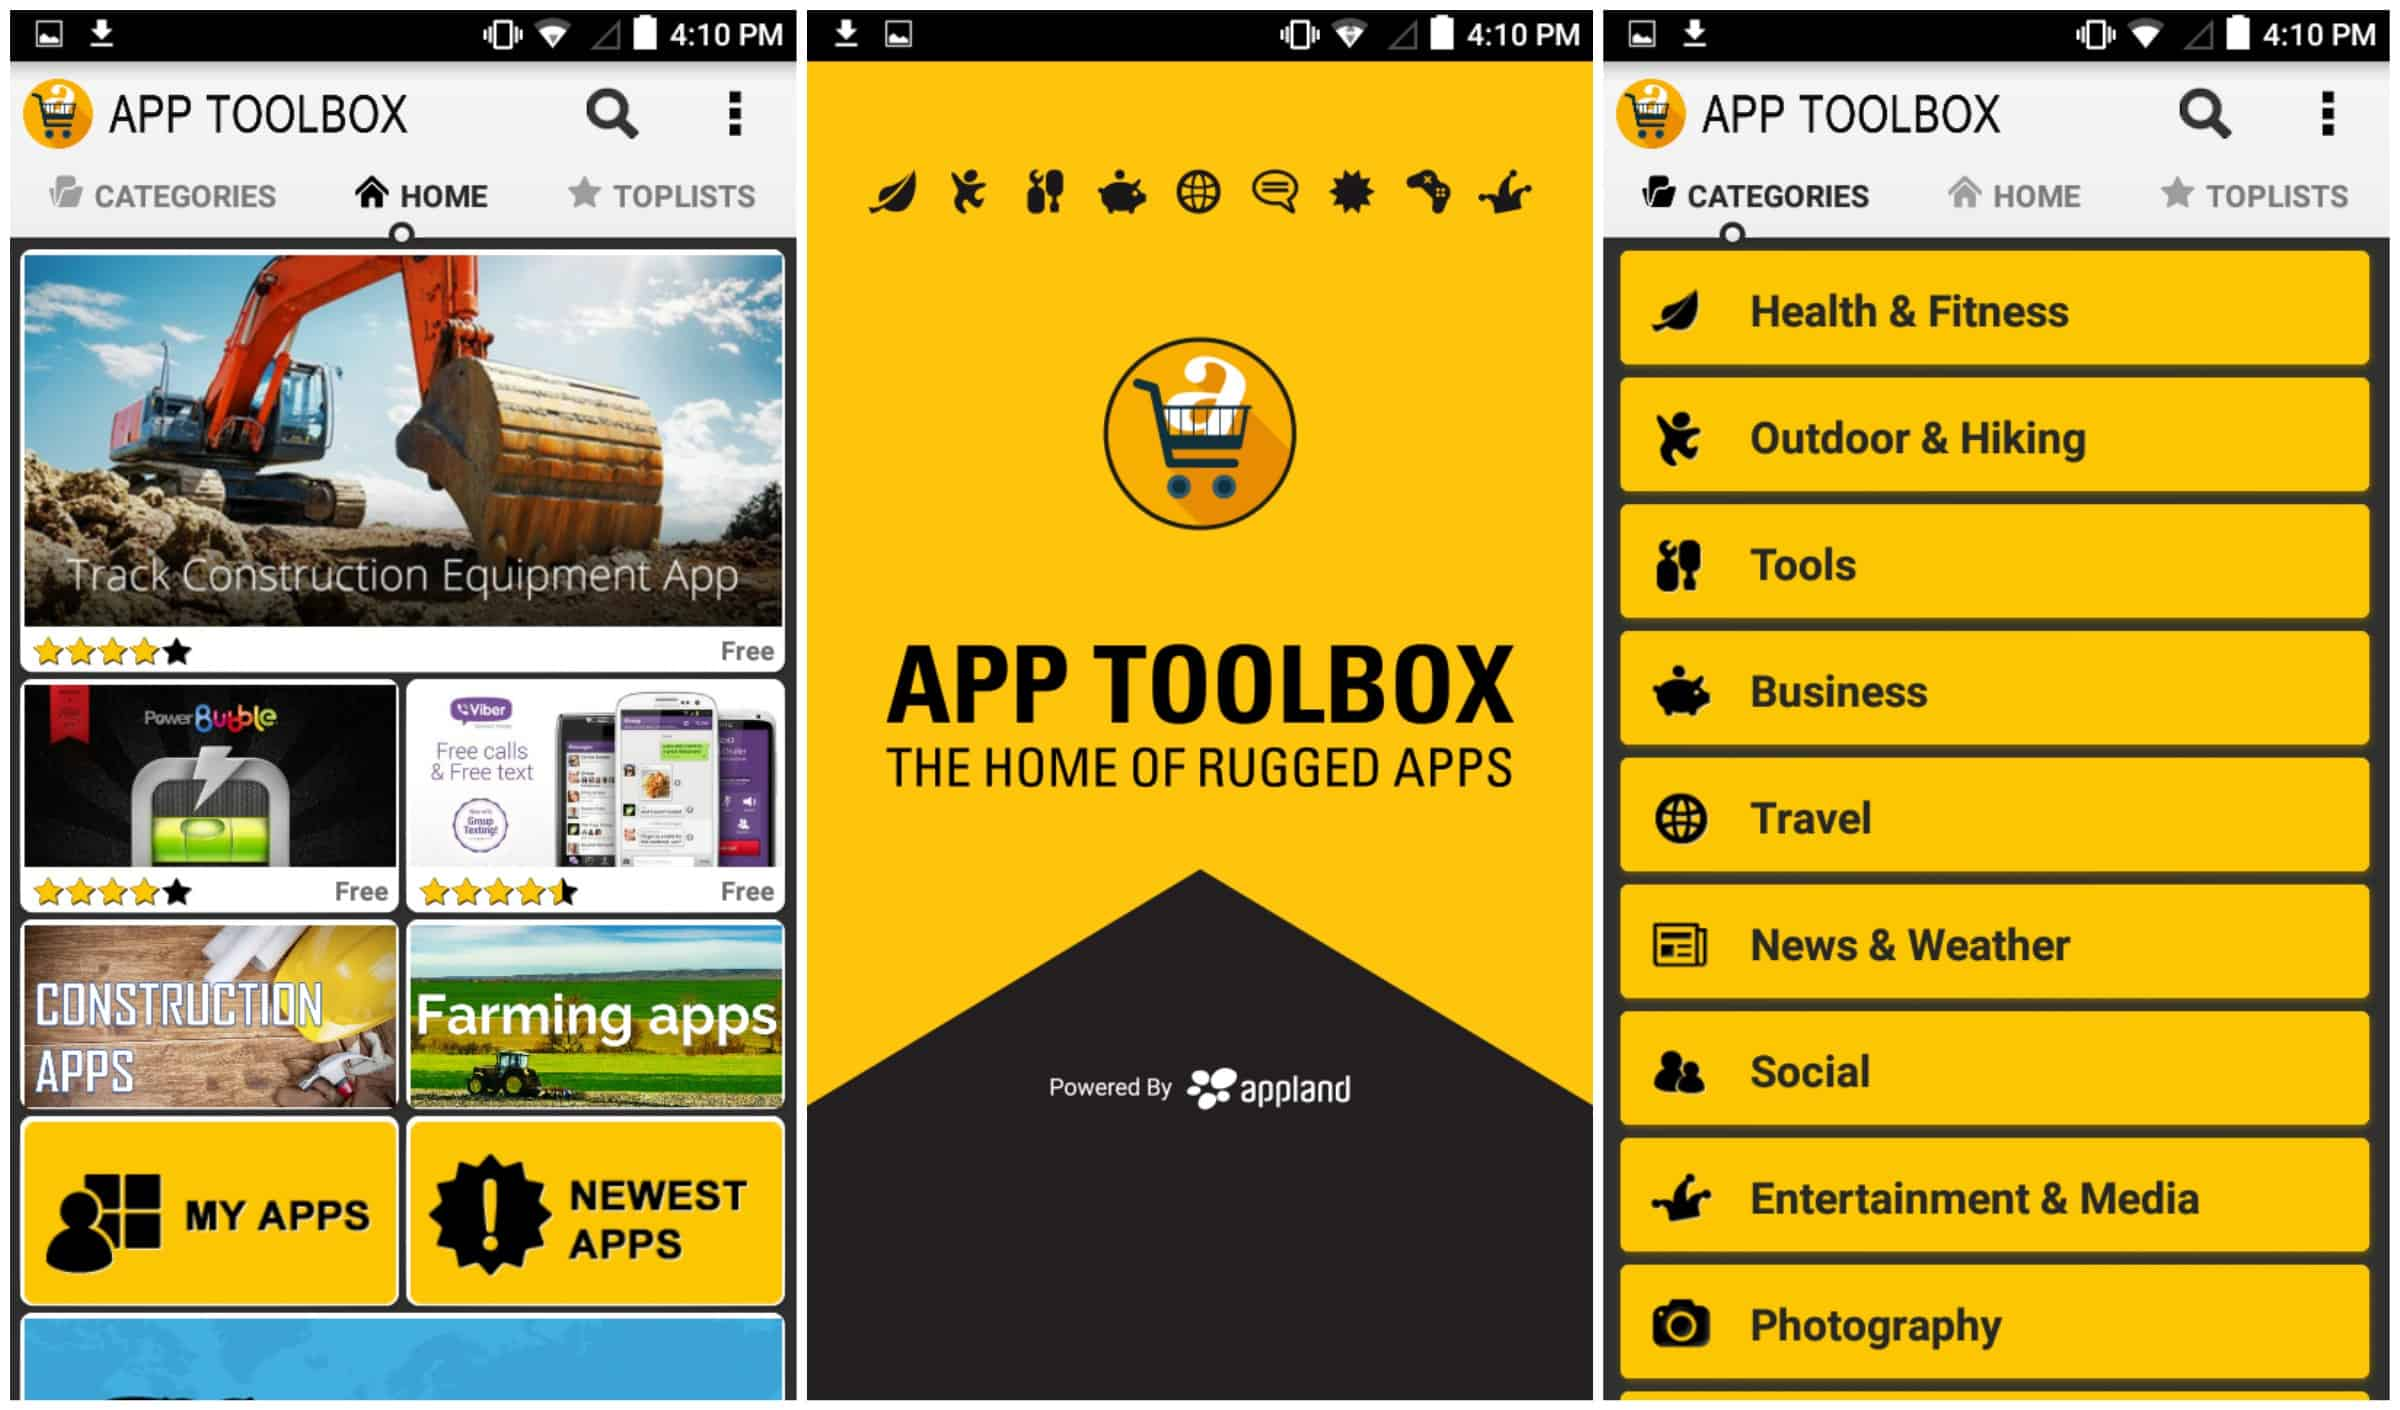 S40 App Toolbox